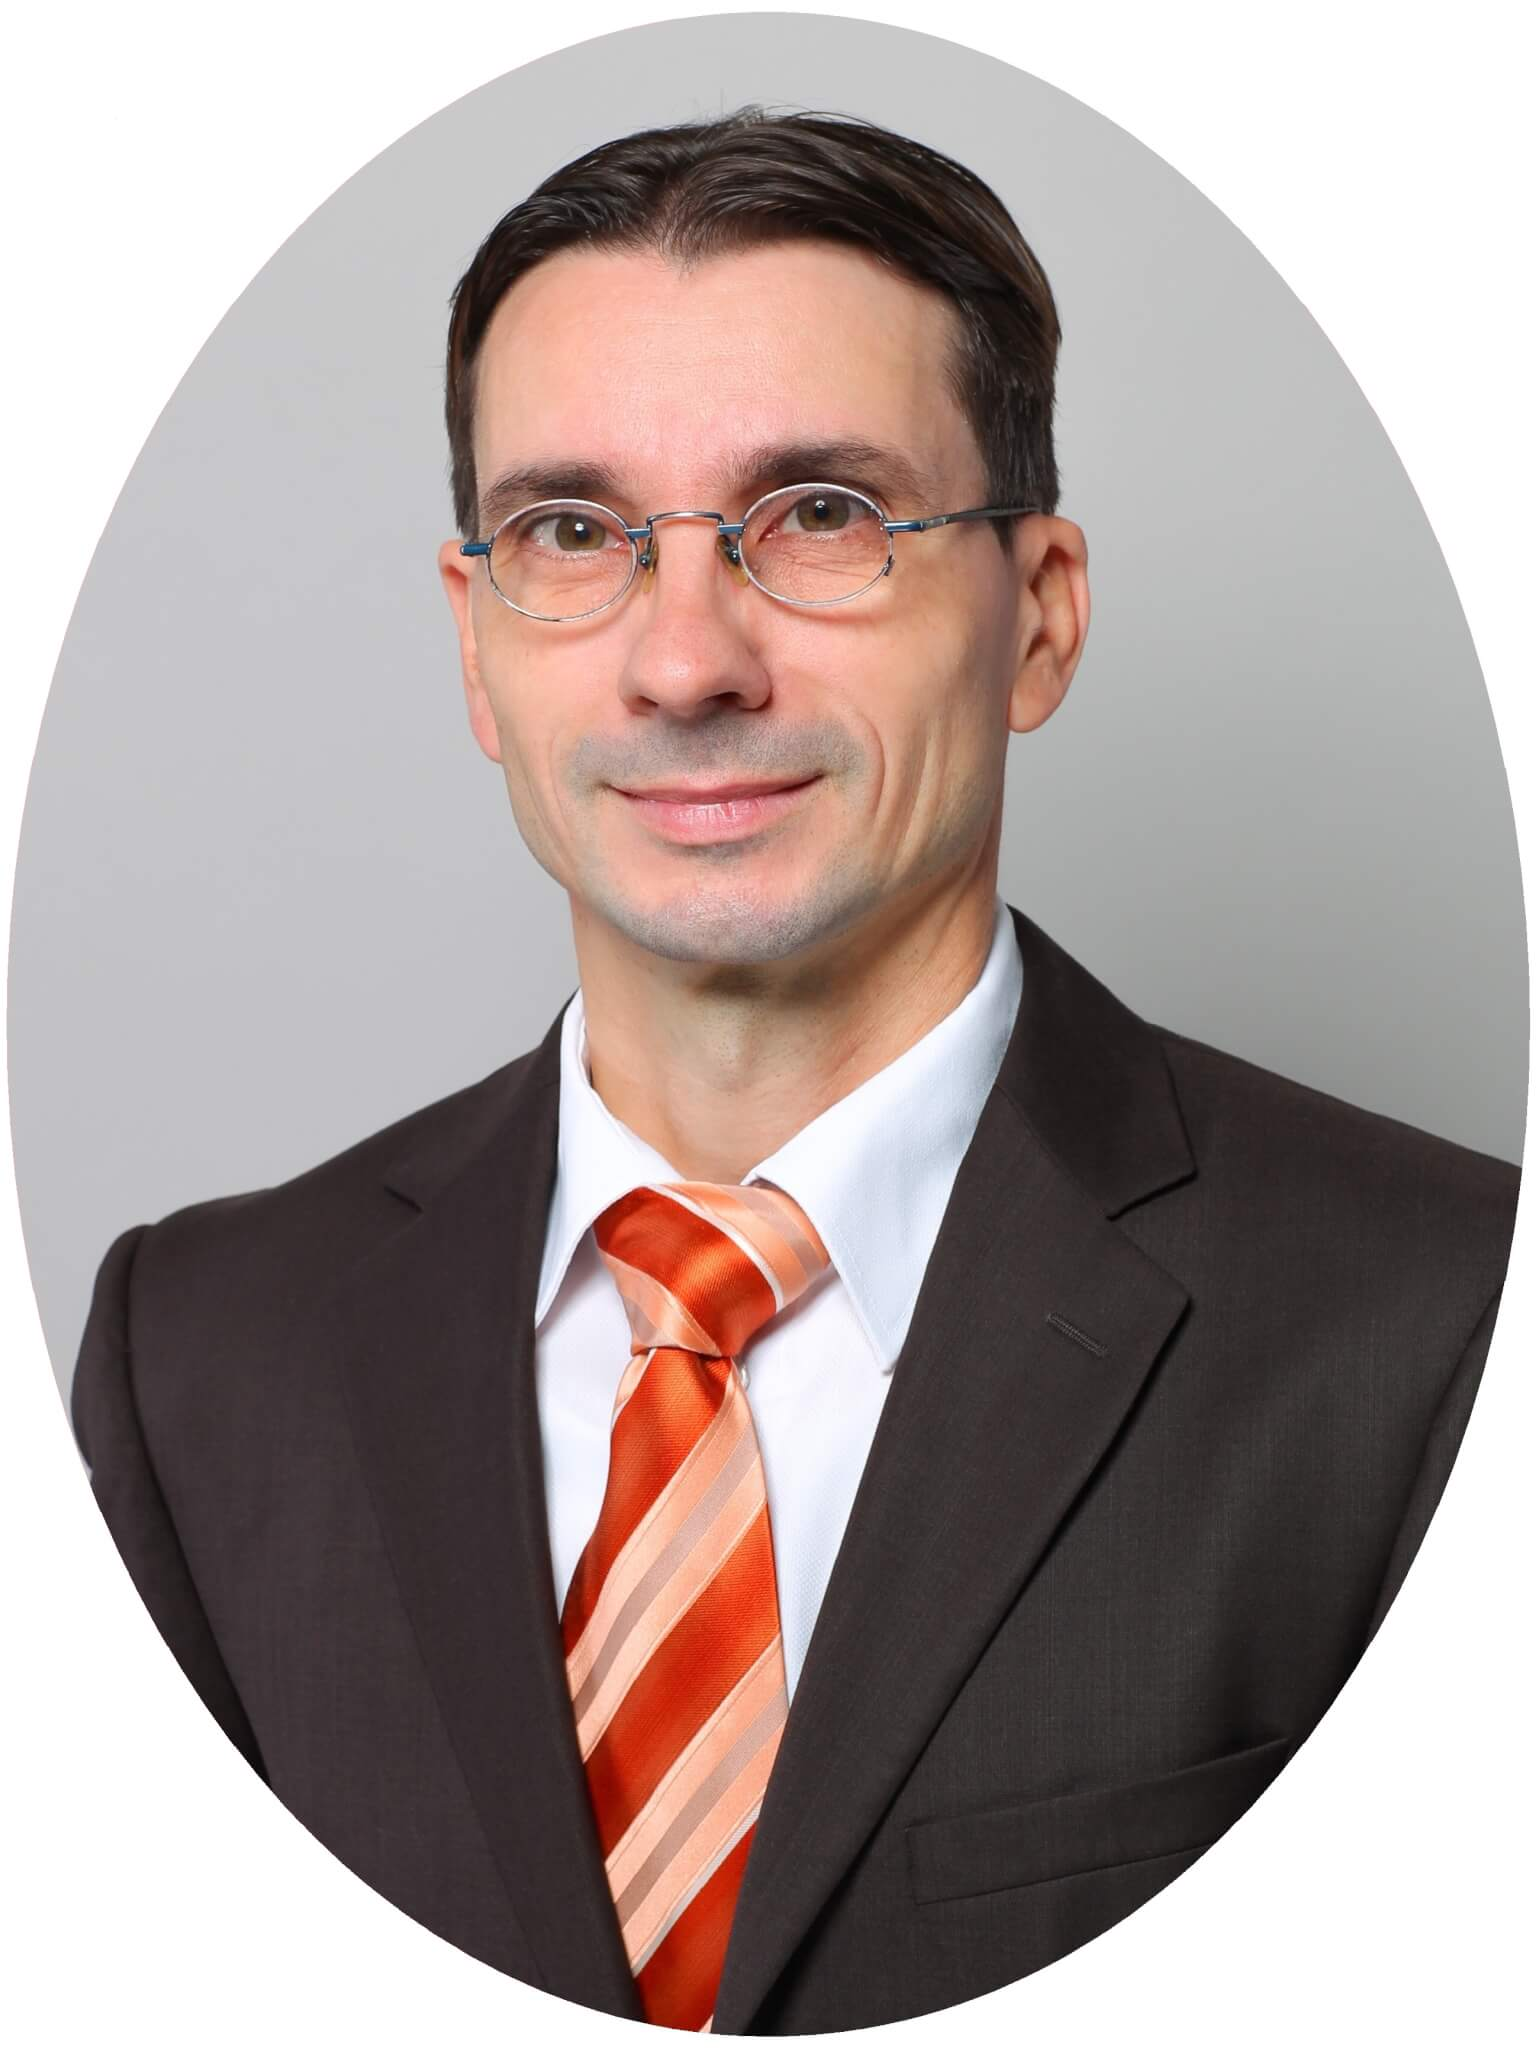 Rechtsanwalt Dennis Dörfler